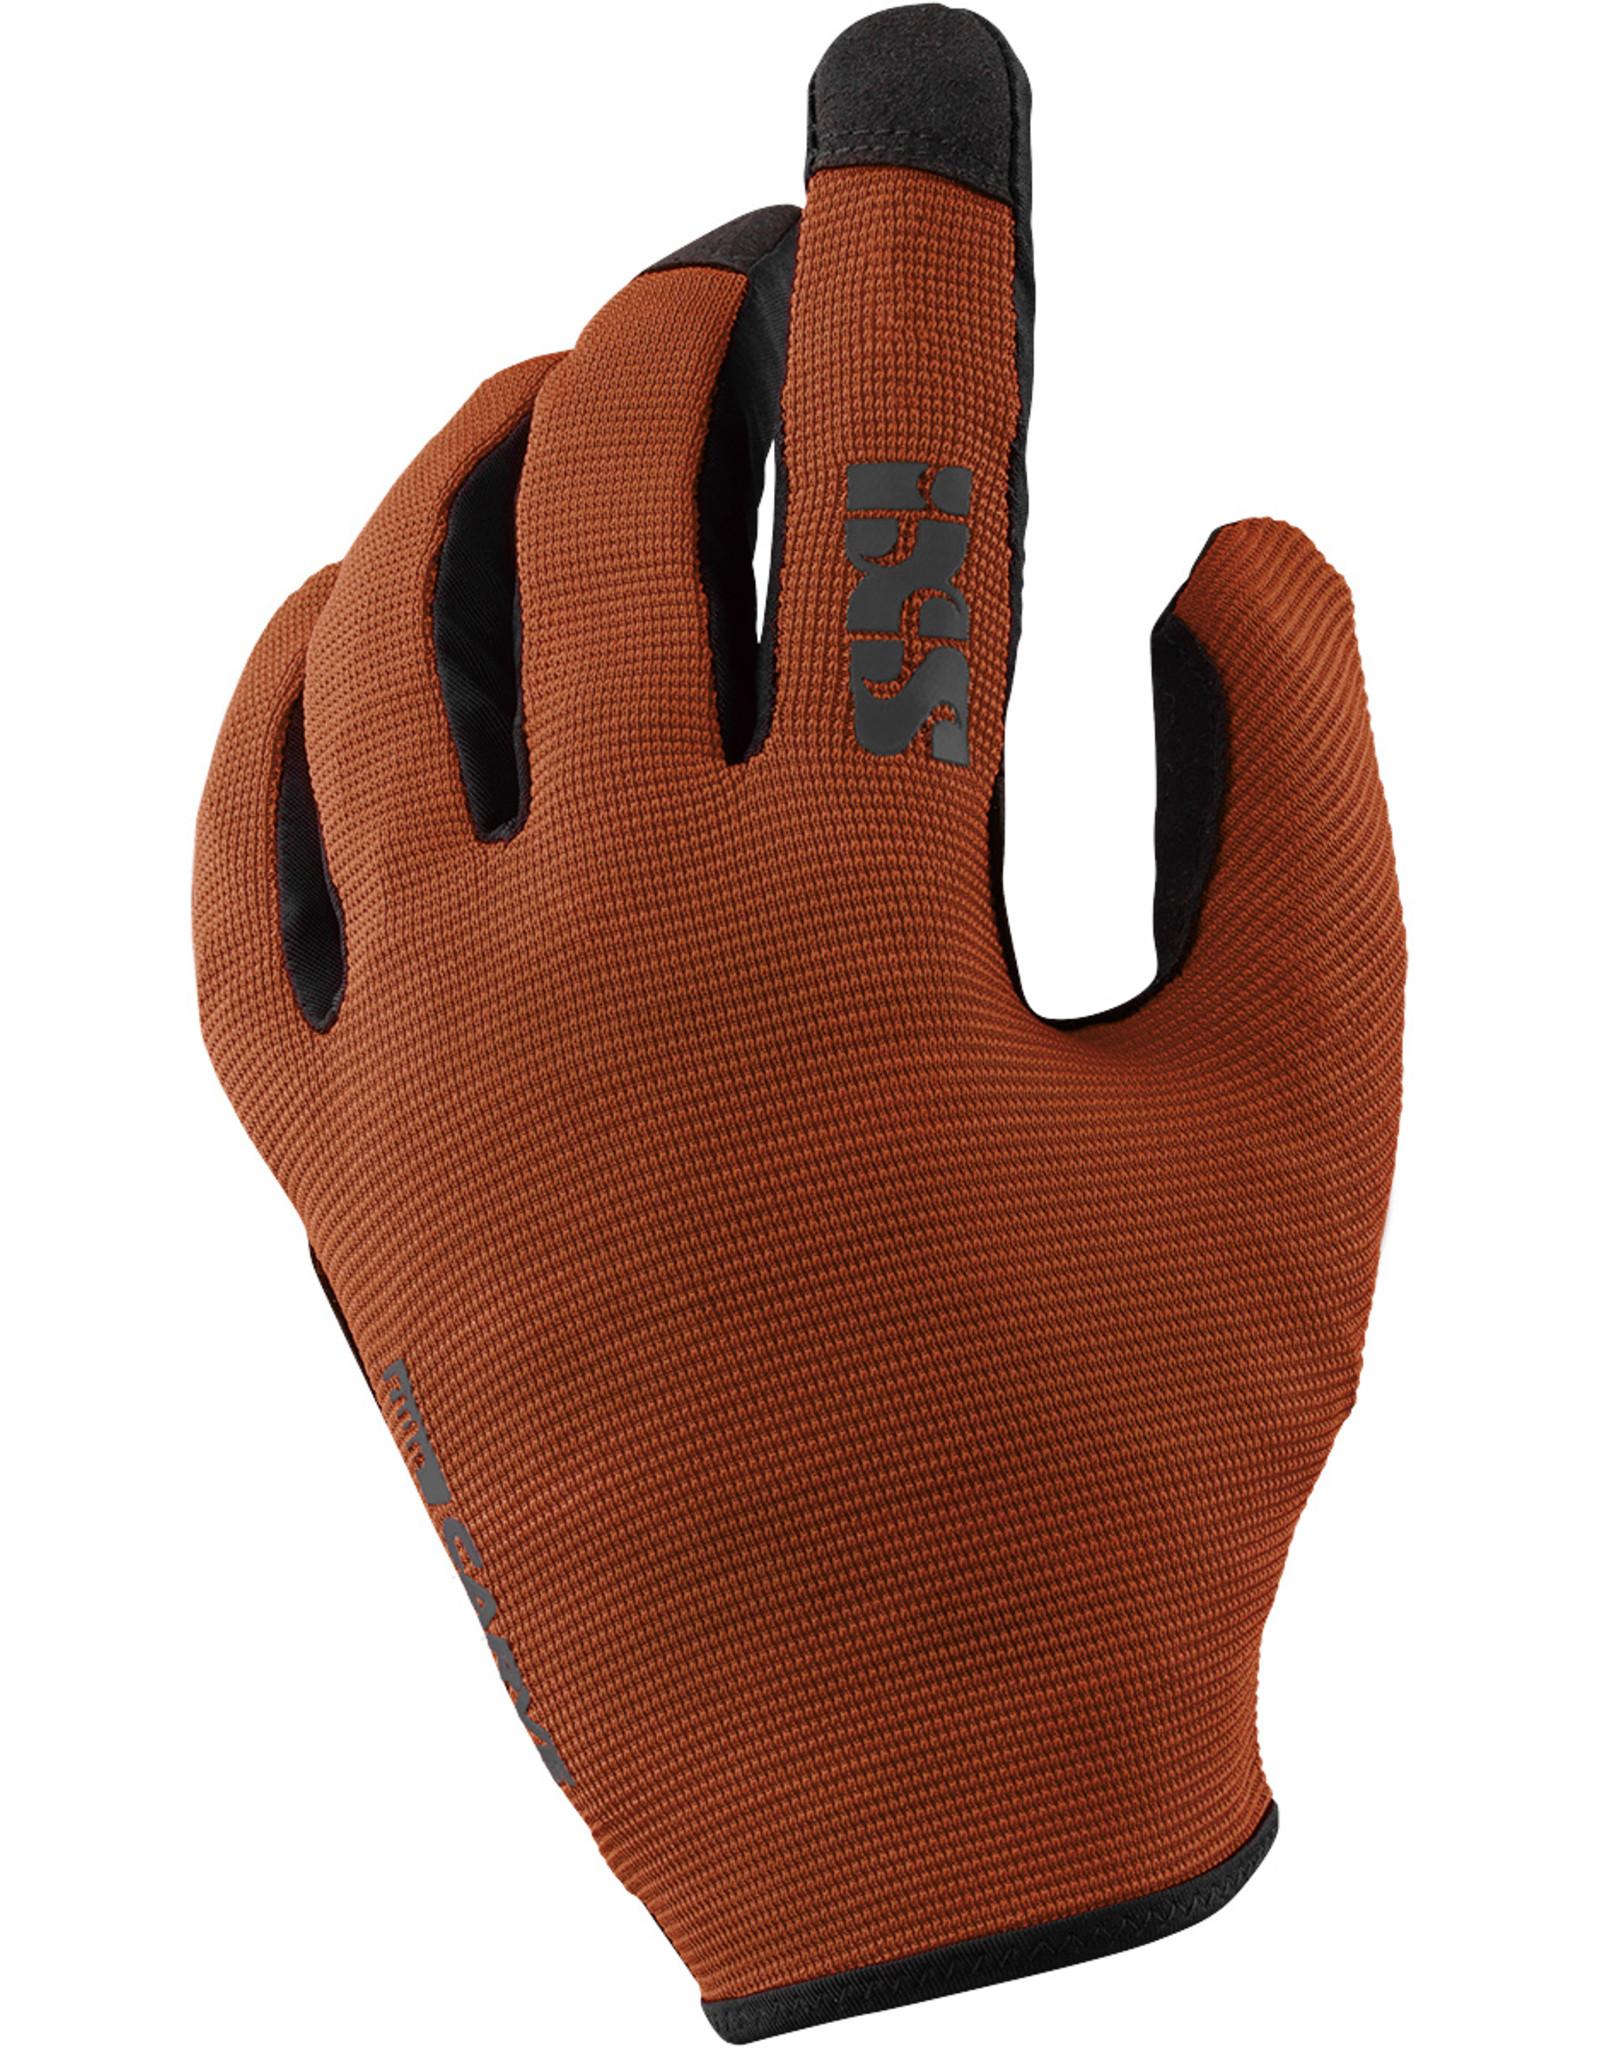 IXS IXS CARVE GLOVE- Burnt Orange